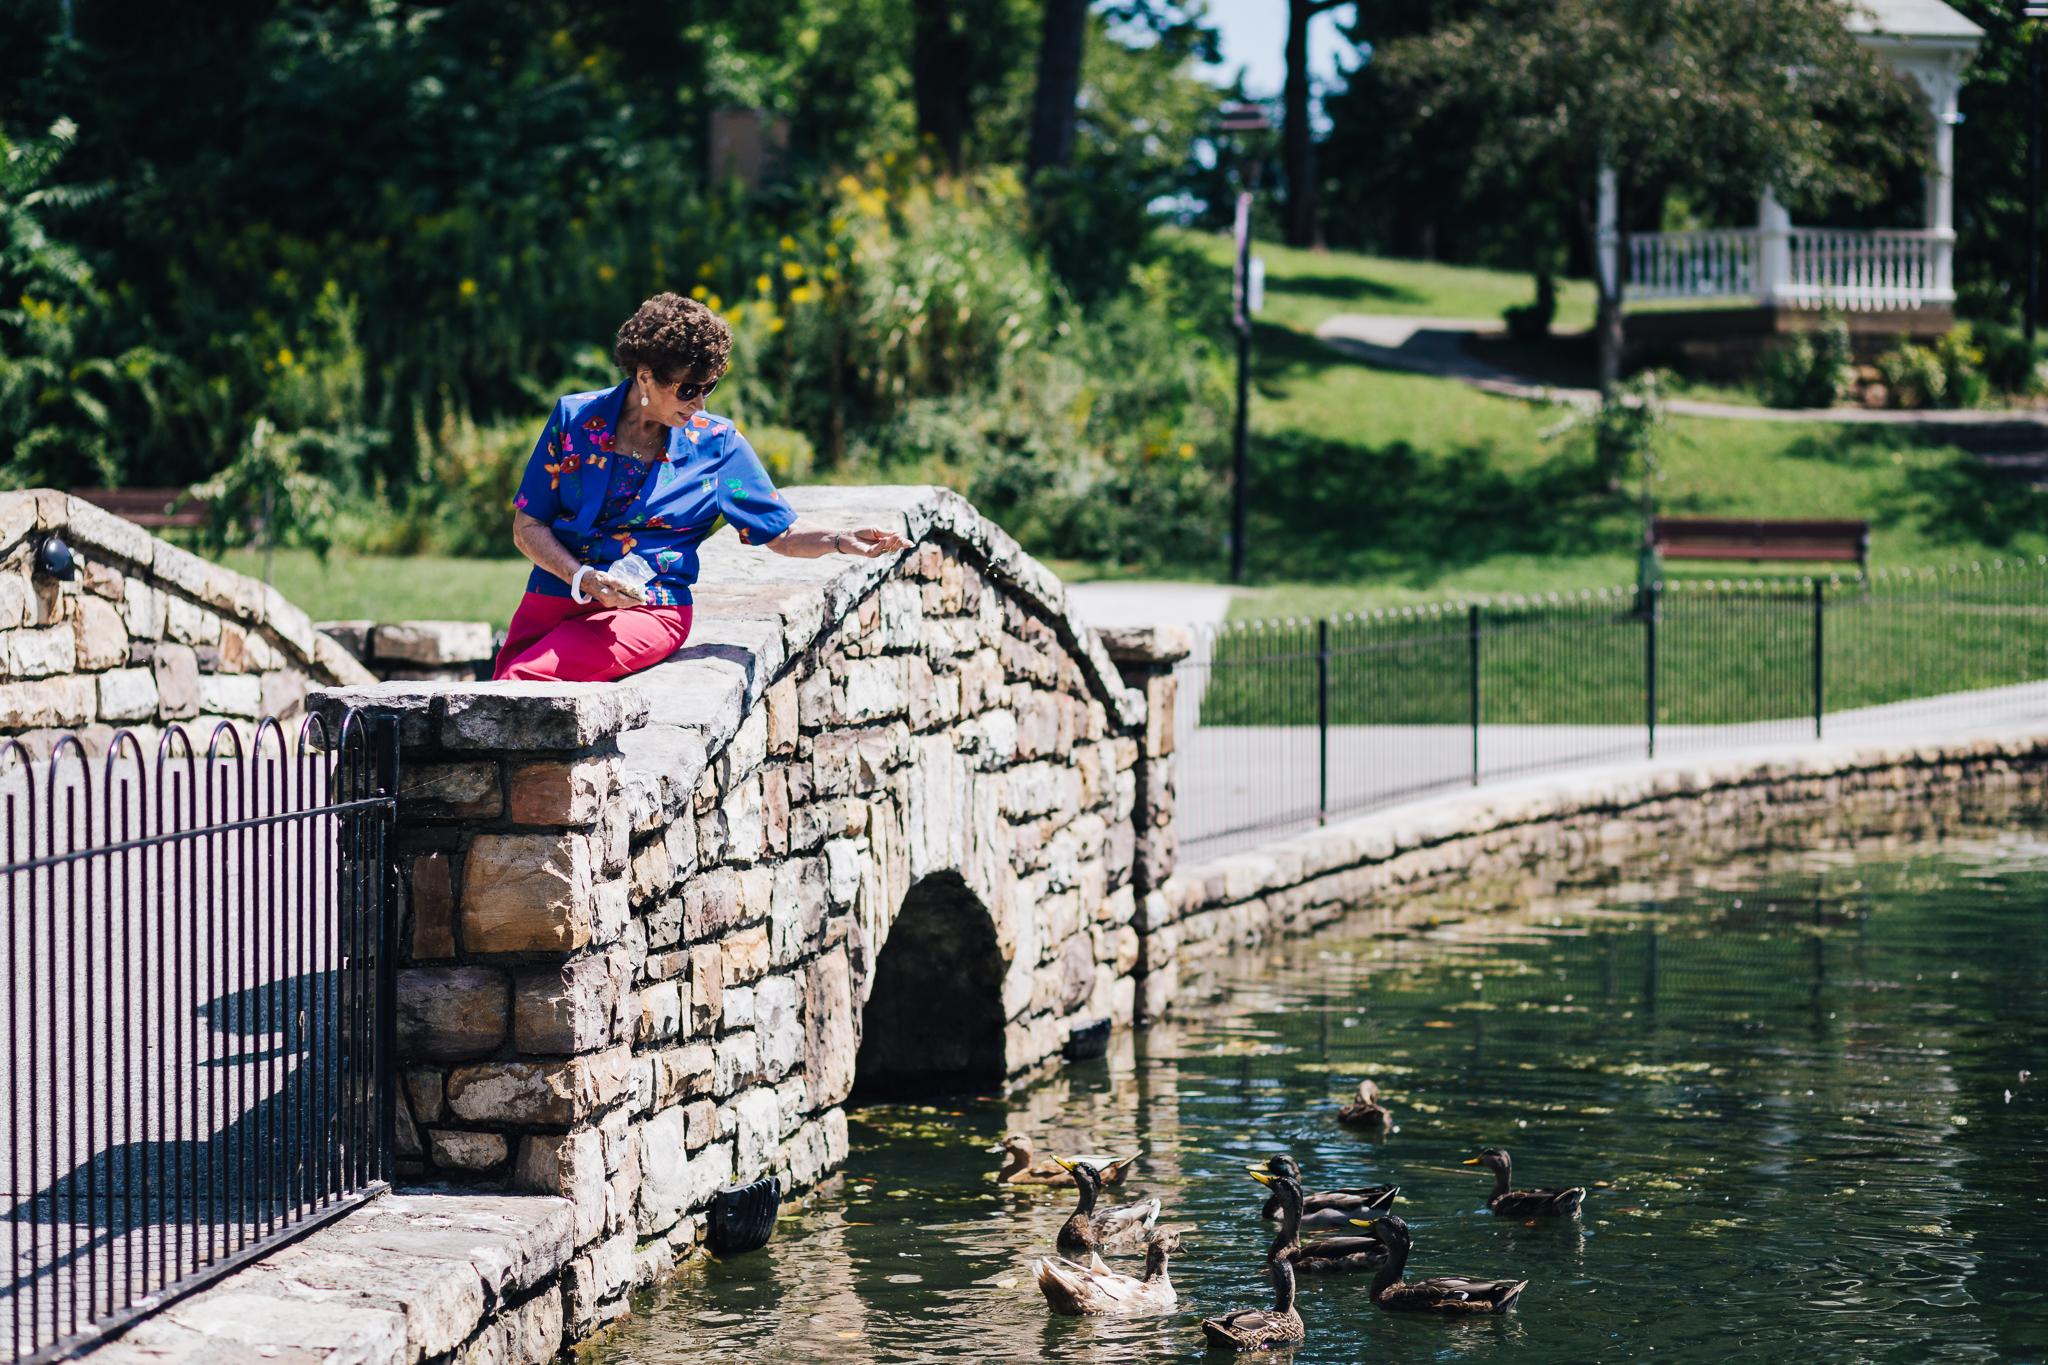 Senior, outdoors, Bridge, lady feeding ducks, Friendship resident